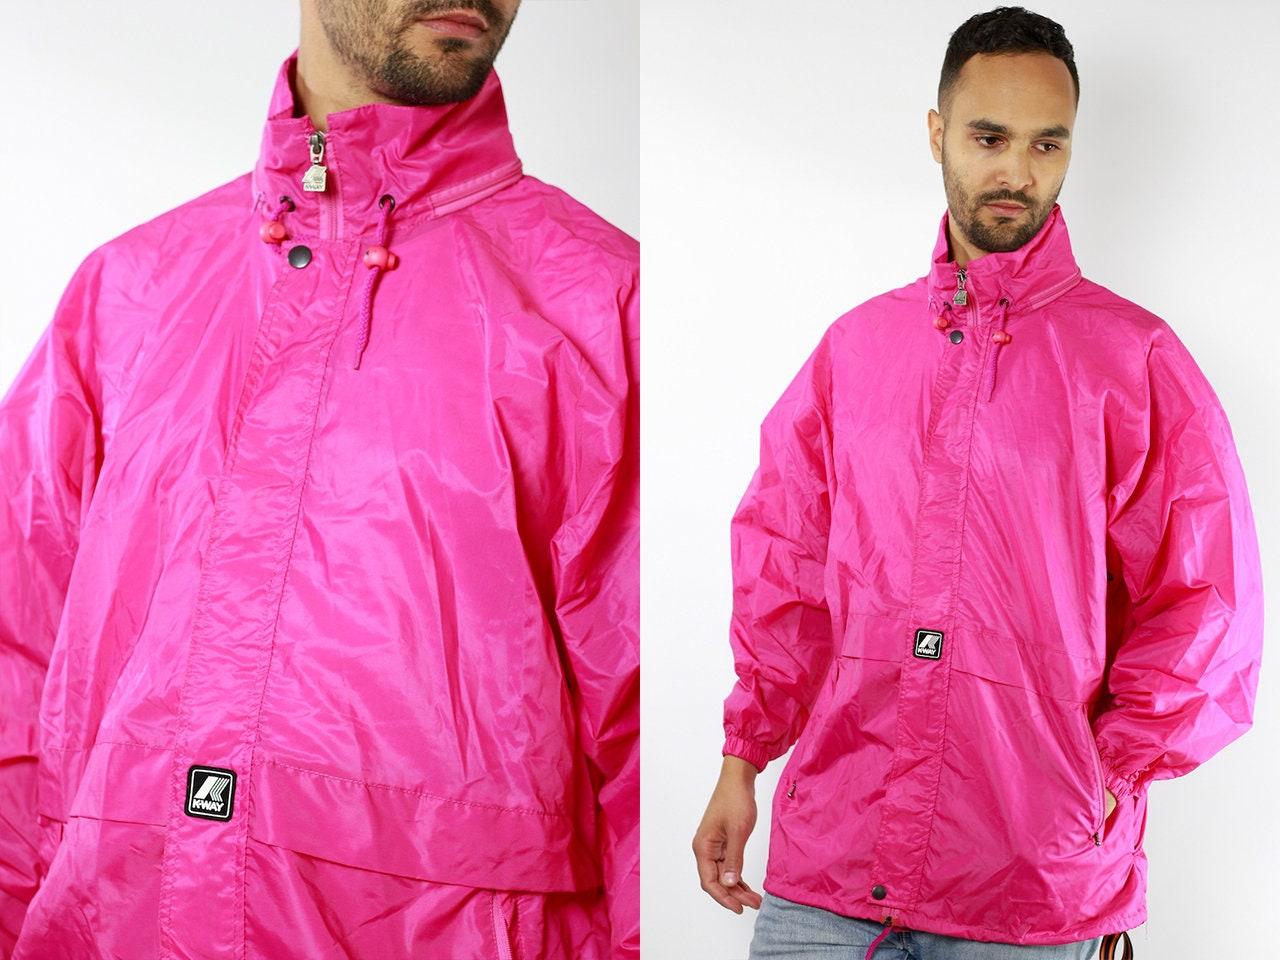 feac11a95 Waterproof Jacket Rain Jacket Festival Jacket Festival Clothing K Way ...